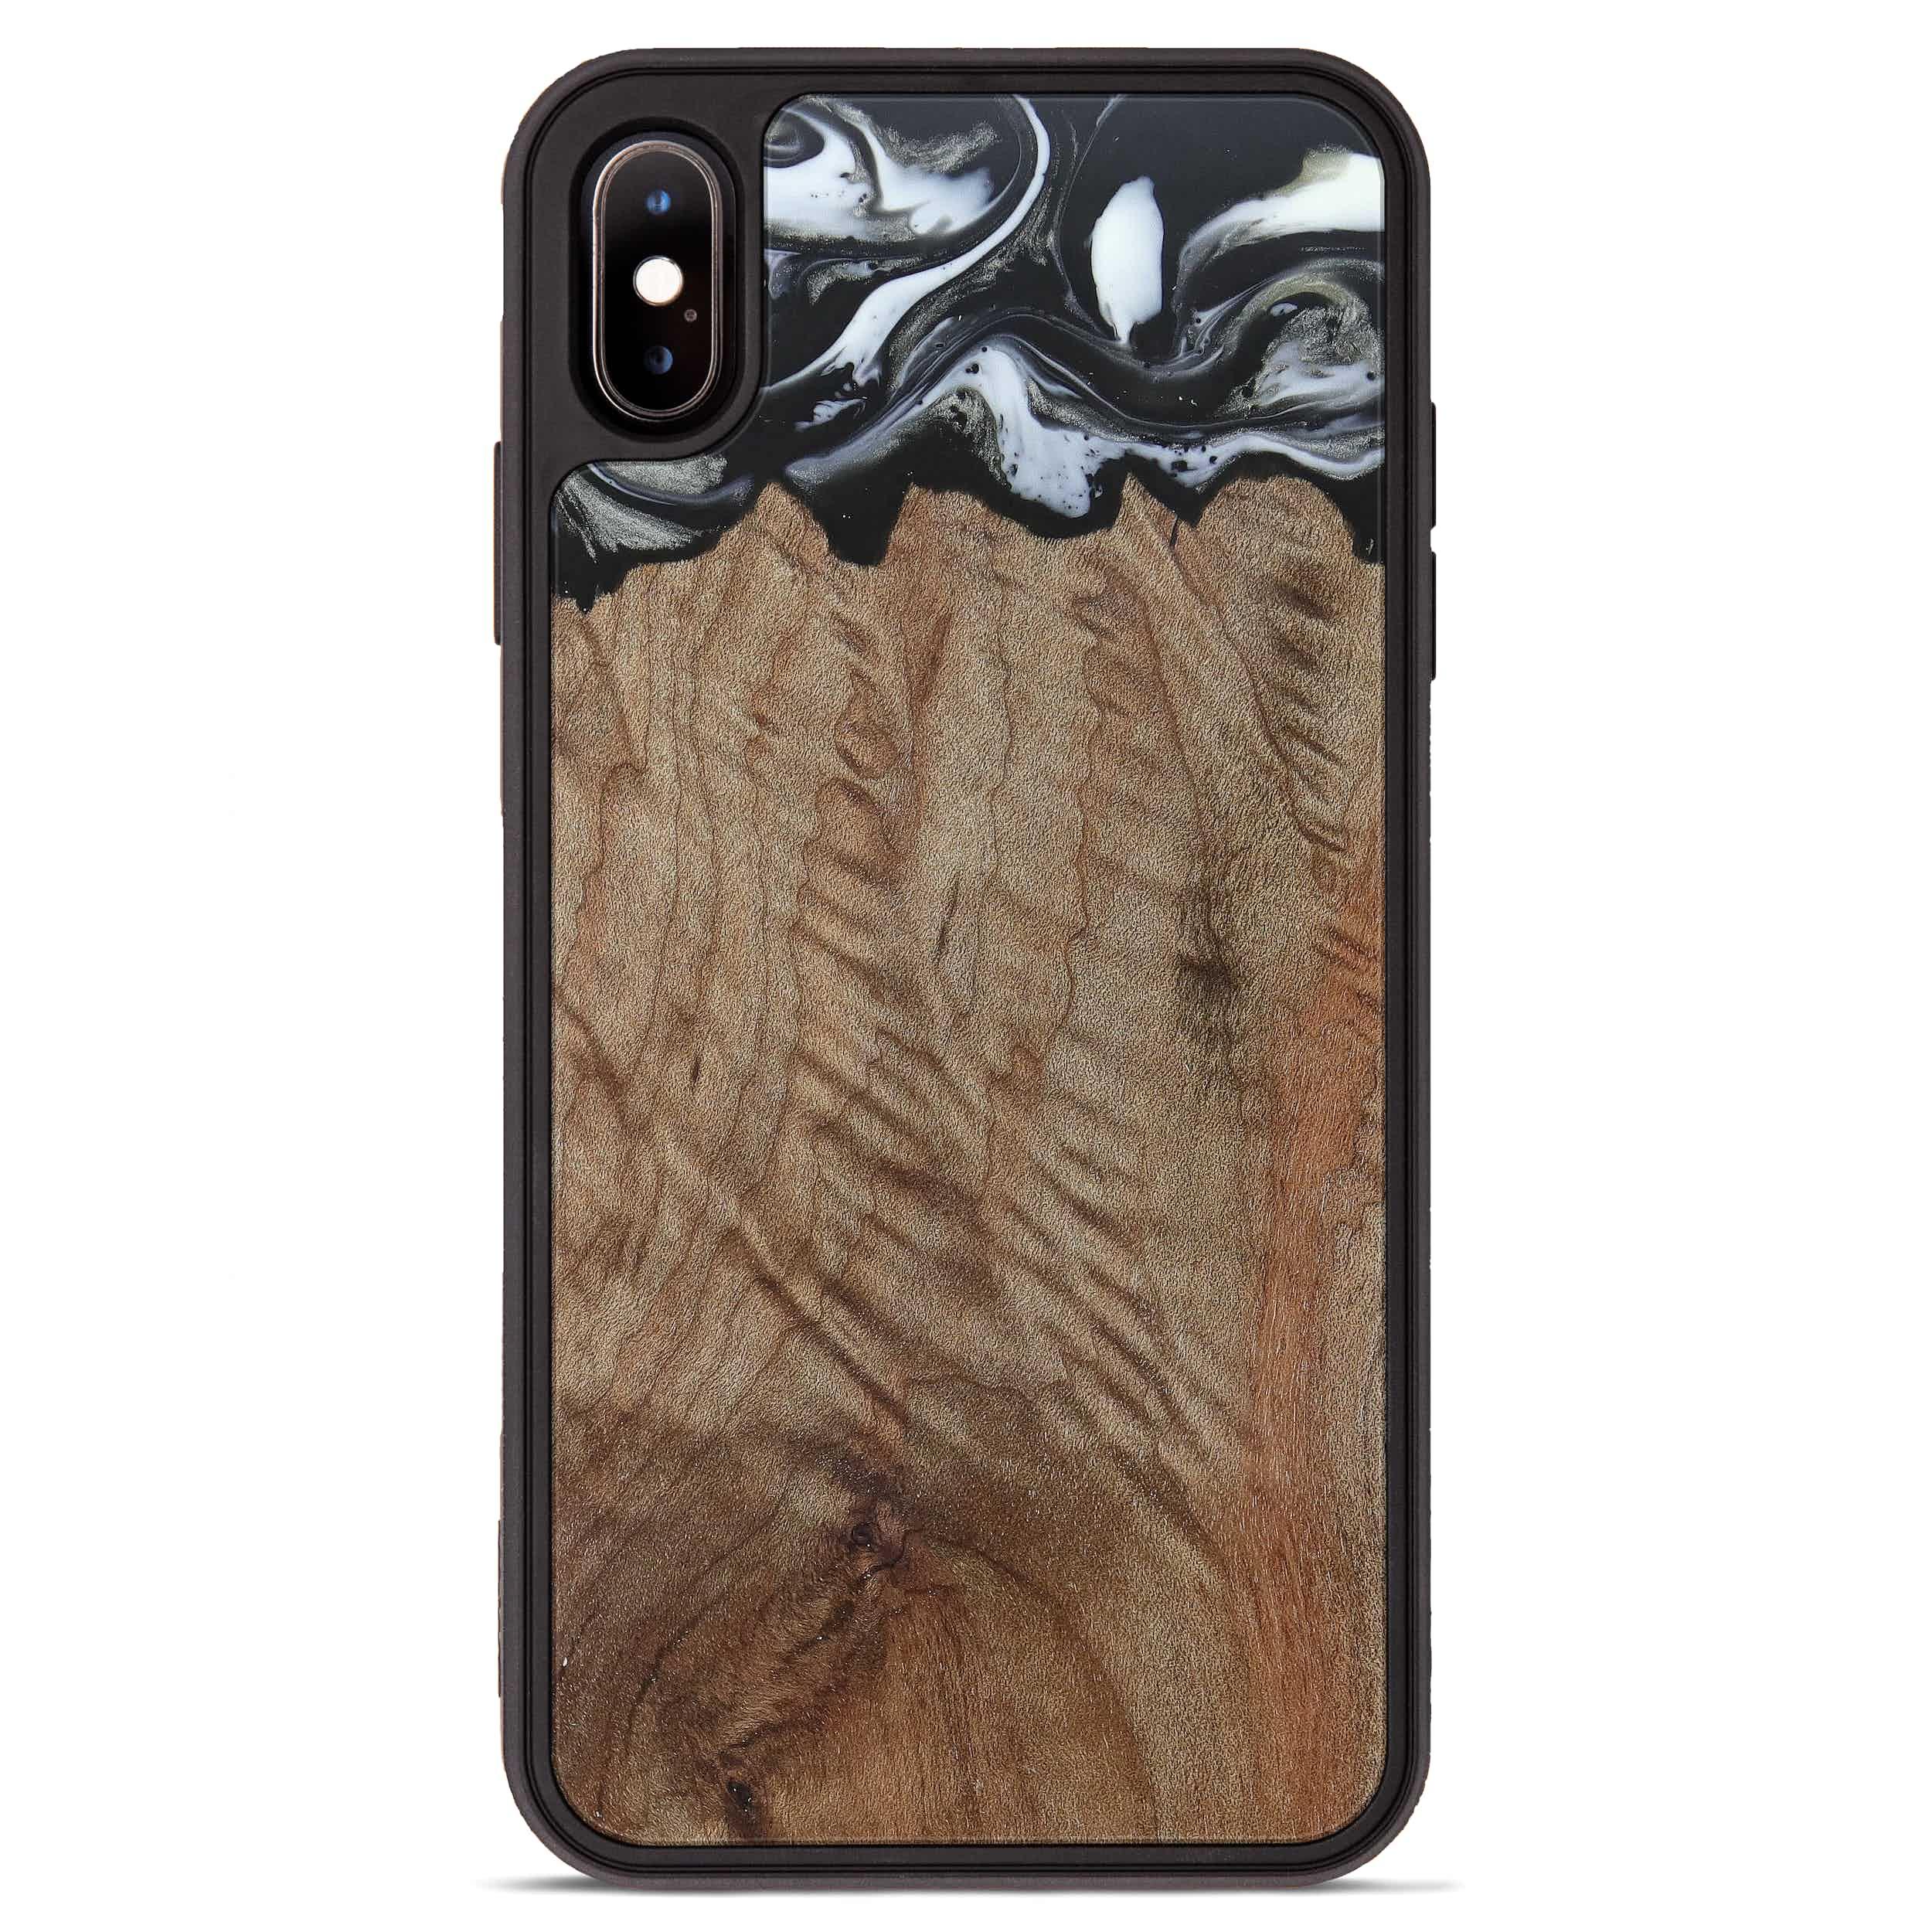 iPhone Xs Max Wood+Resin Phone Case - Kiem (Black & White, 385907)